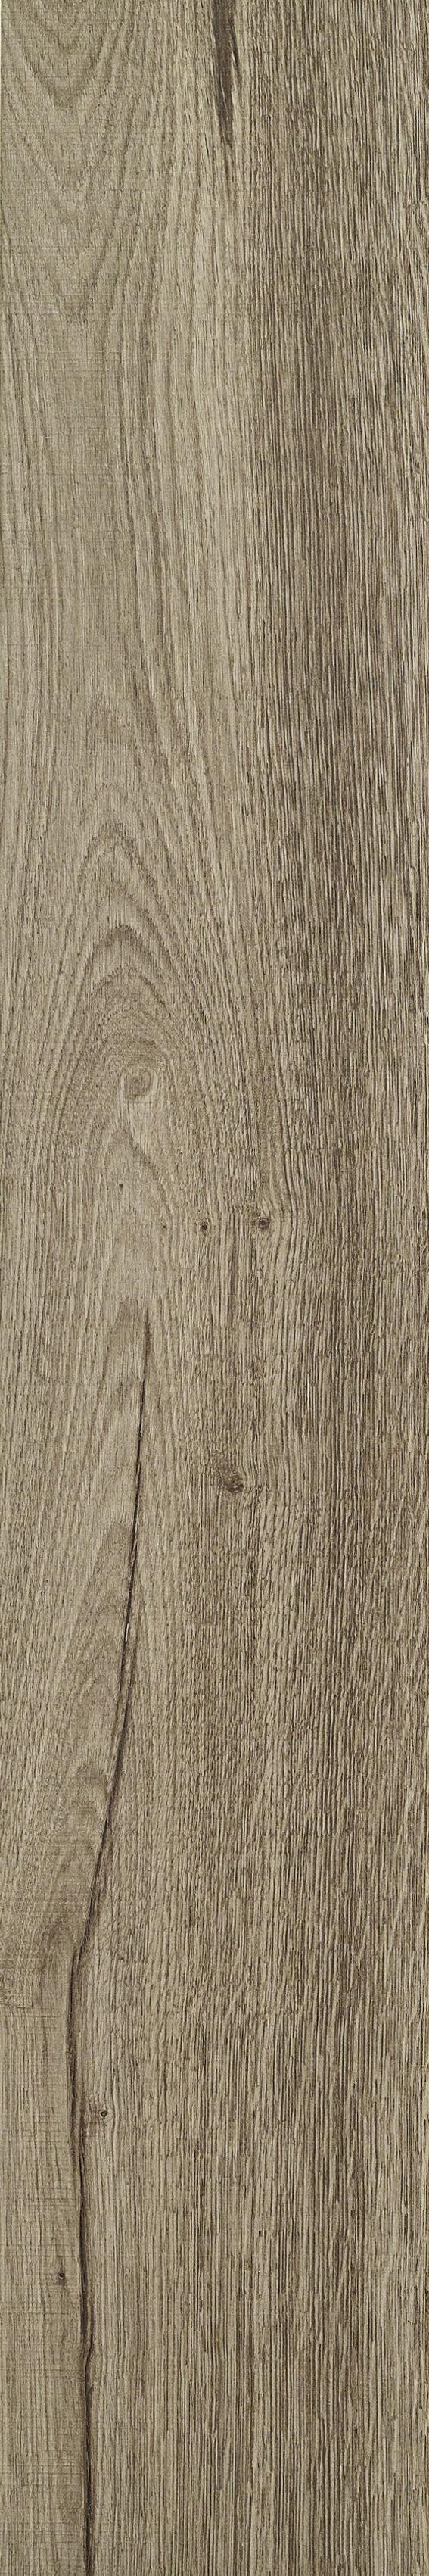 Jungle Beige Porcelain Planks 1200x400x20mm – 19.2m2 Pack